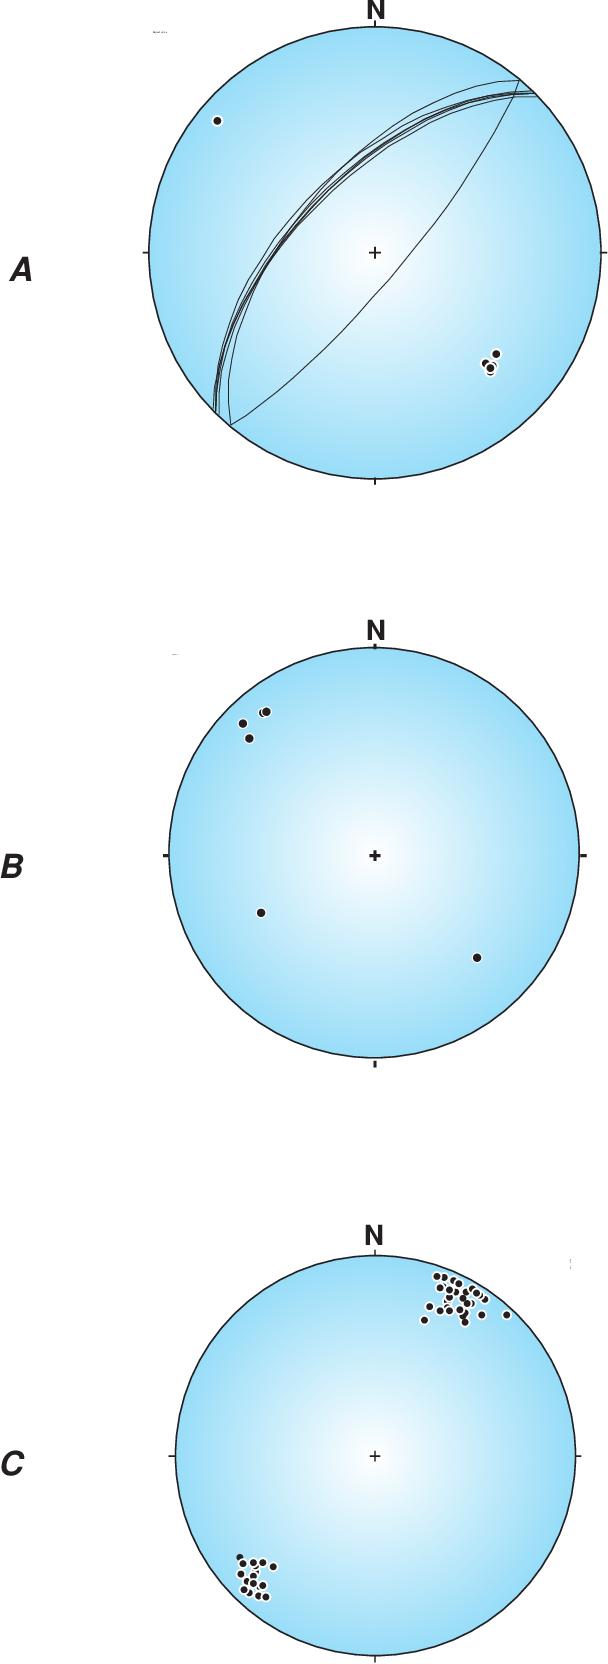 figure 6.78